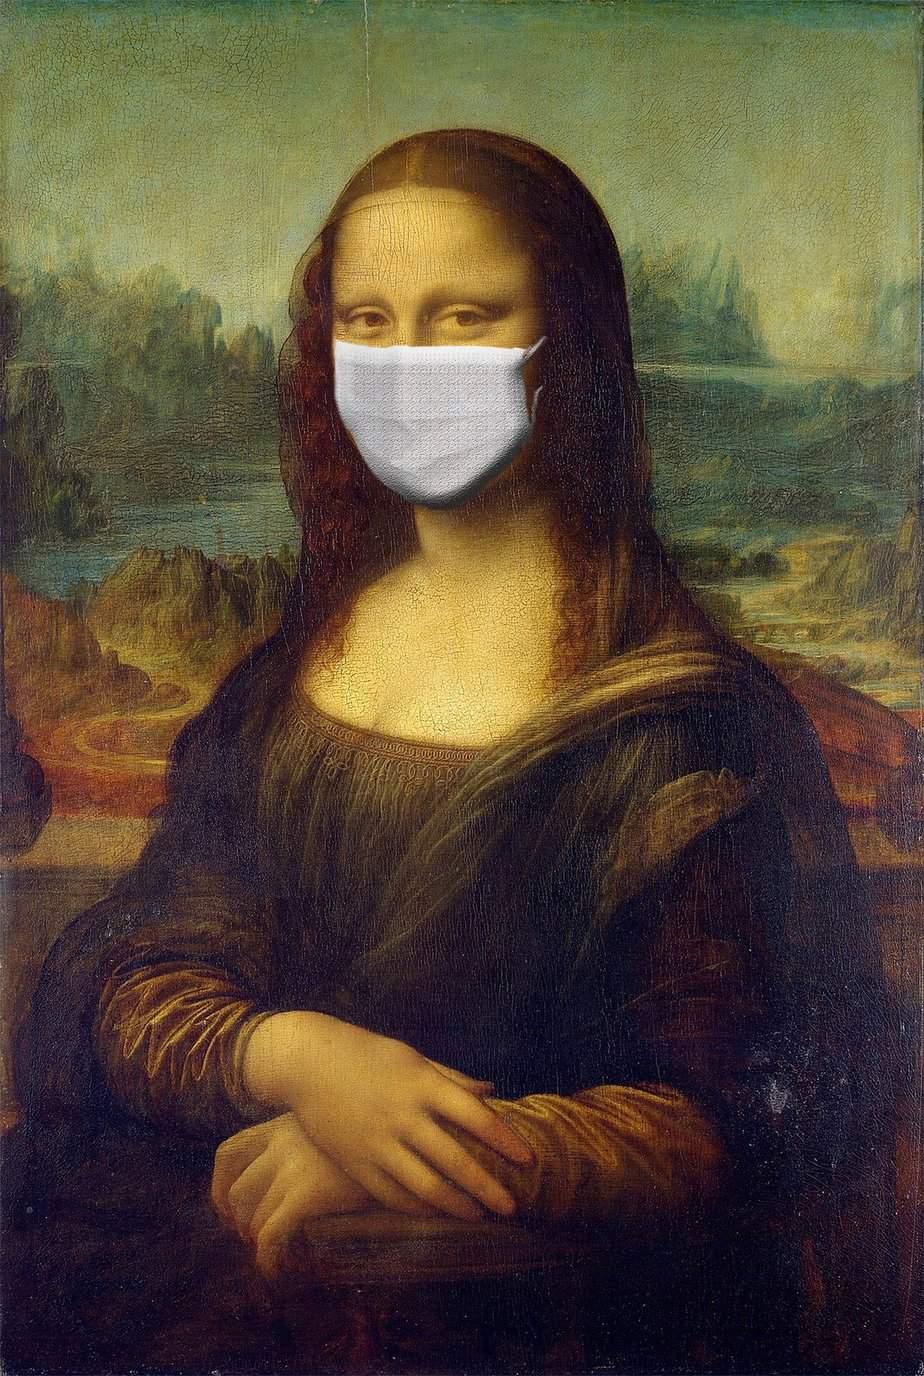 TalkInFrench.com Mona Lisa Mask